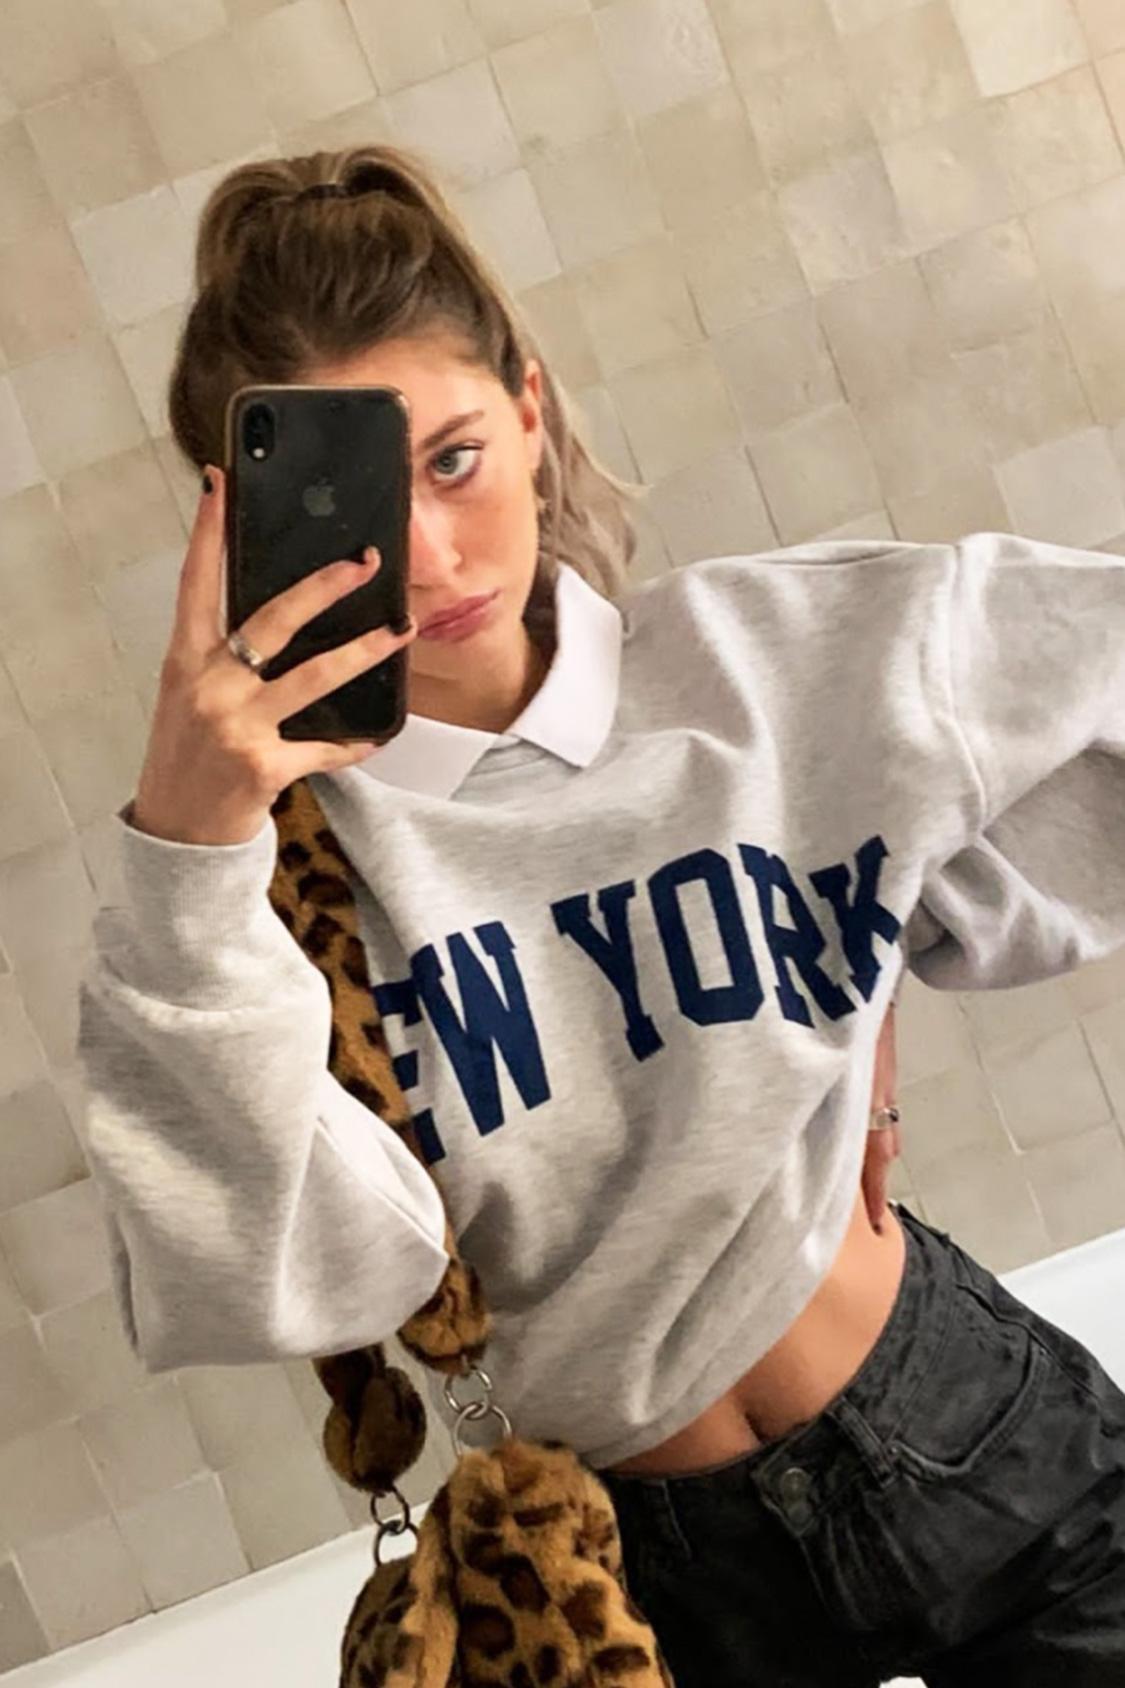 New York sweatshirt with collar